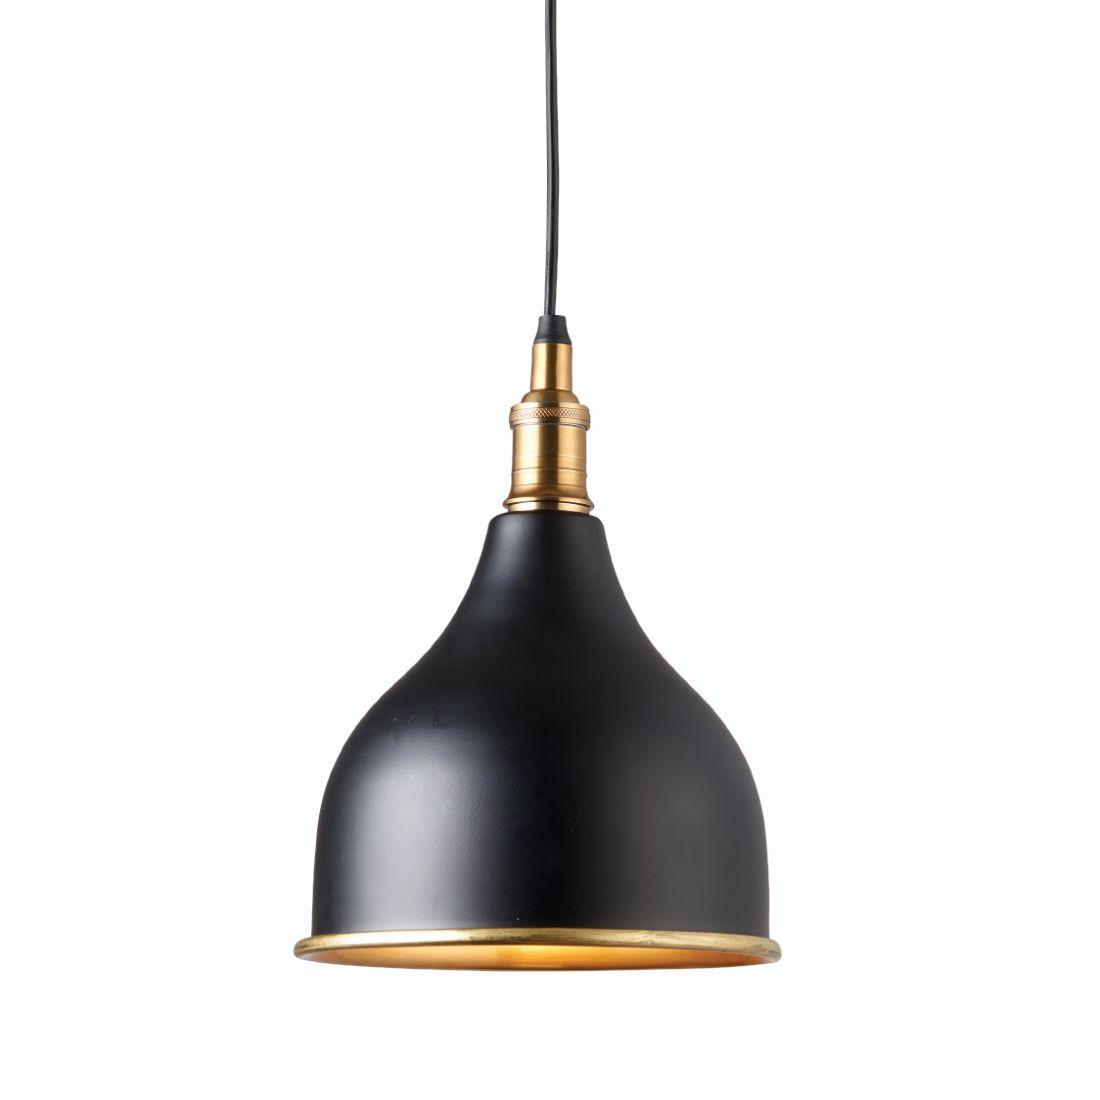 Taylor Black Gold Pendant Light Primrose Plum Gold Pendant Lighting Black Pendant Light Gold Pendant Light Kitchen